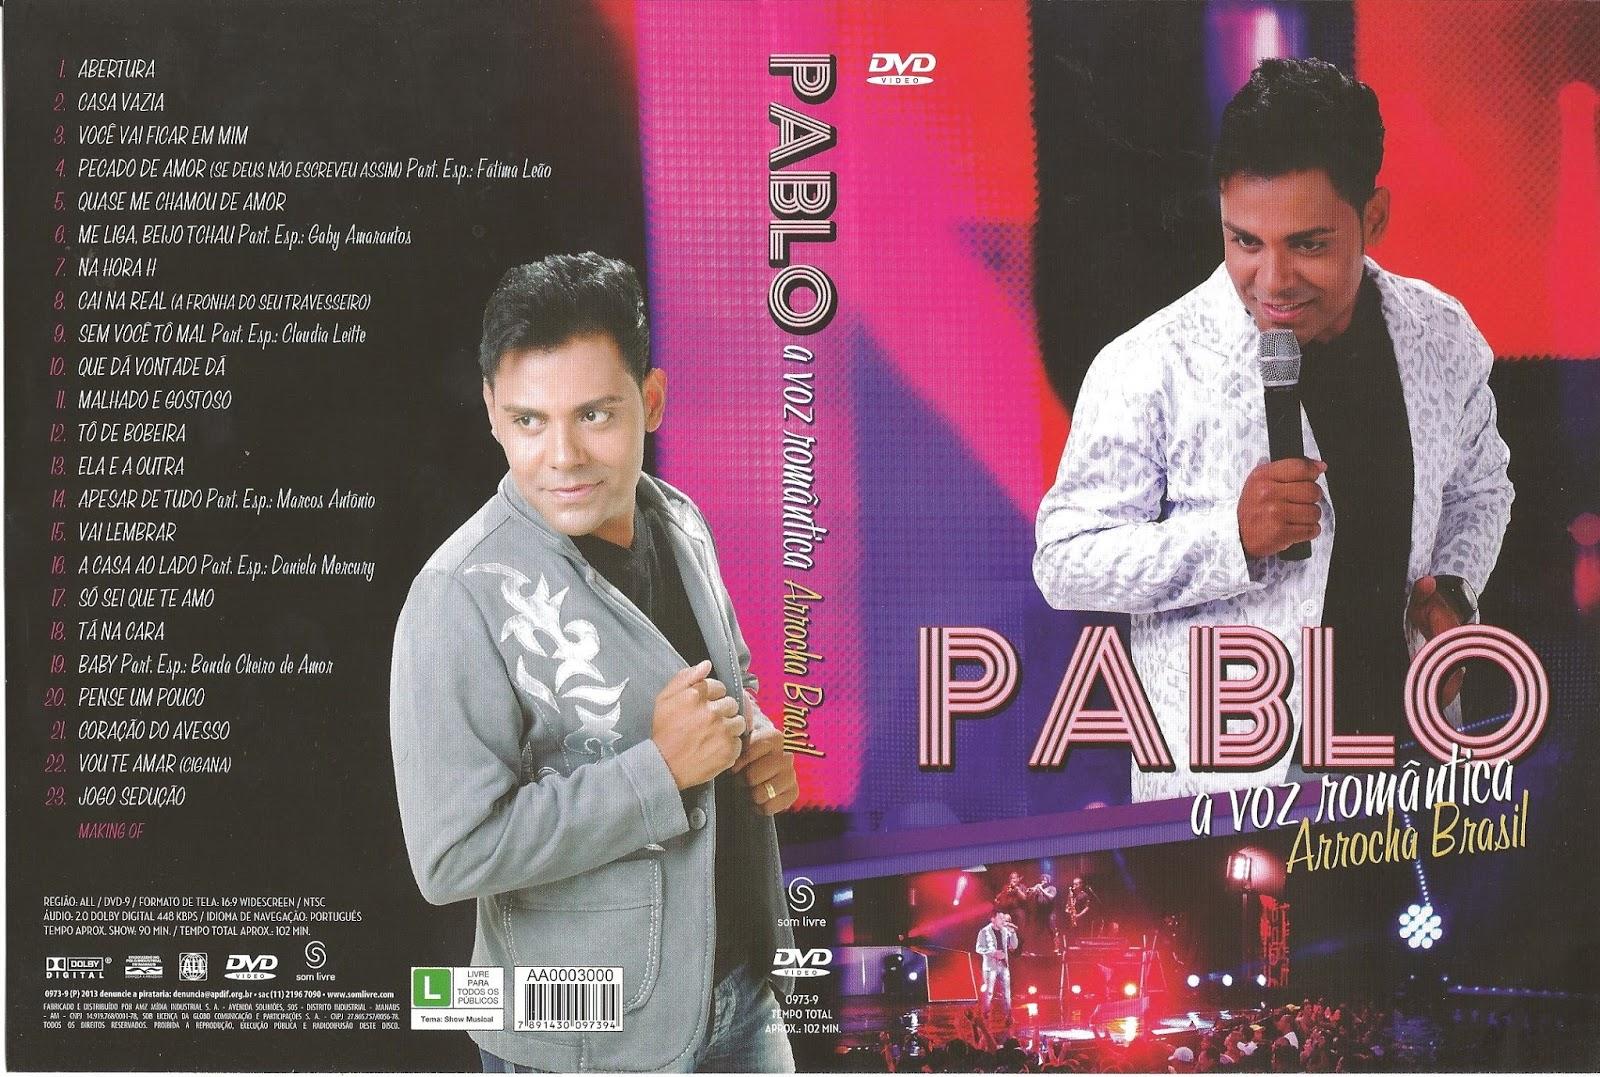 Pablo: A Voz Romântica Arrocha Brasil DVDRip XviD 2013 Pablo   A Voz Romantica   Arrocha Brasil   Capa Show DVD